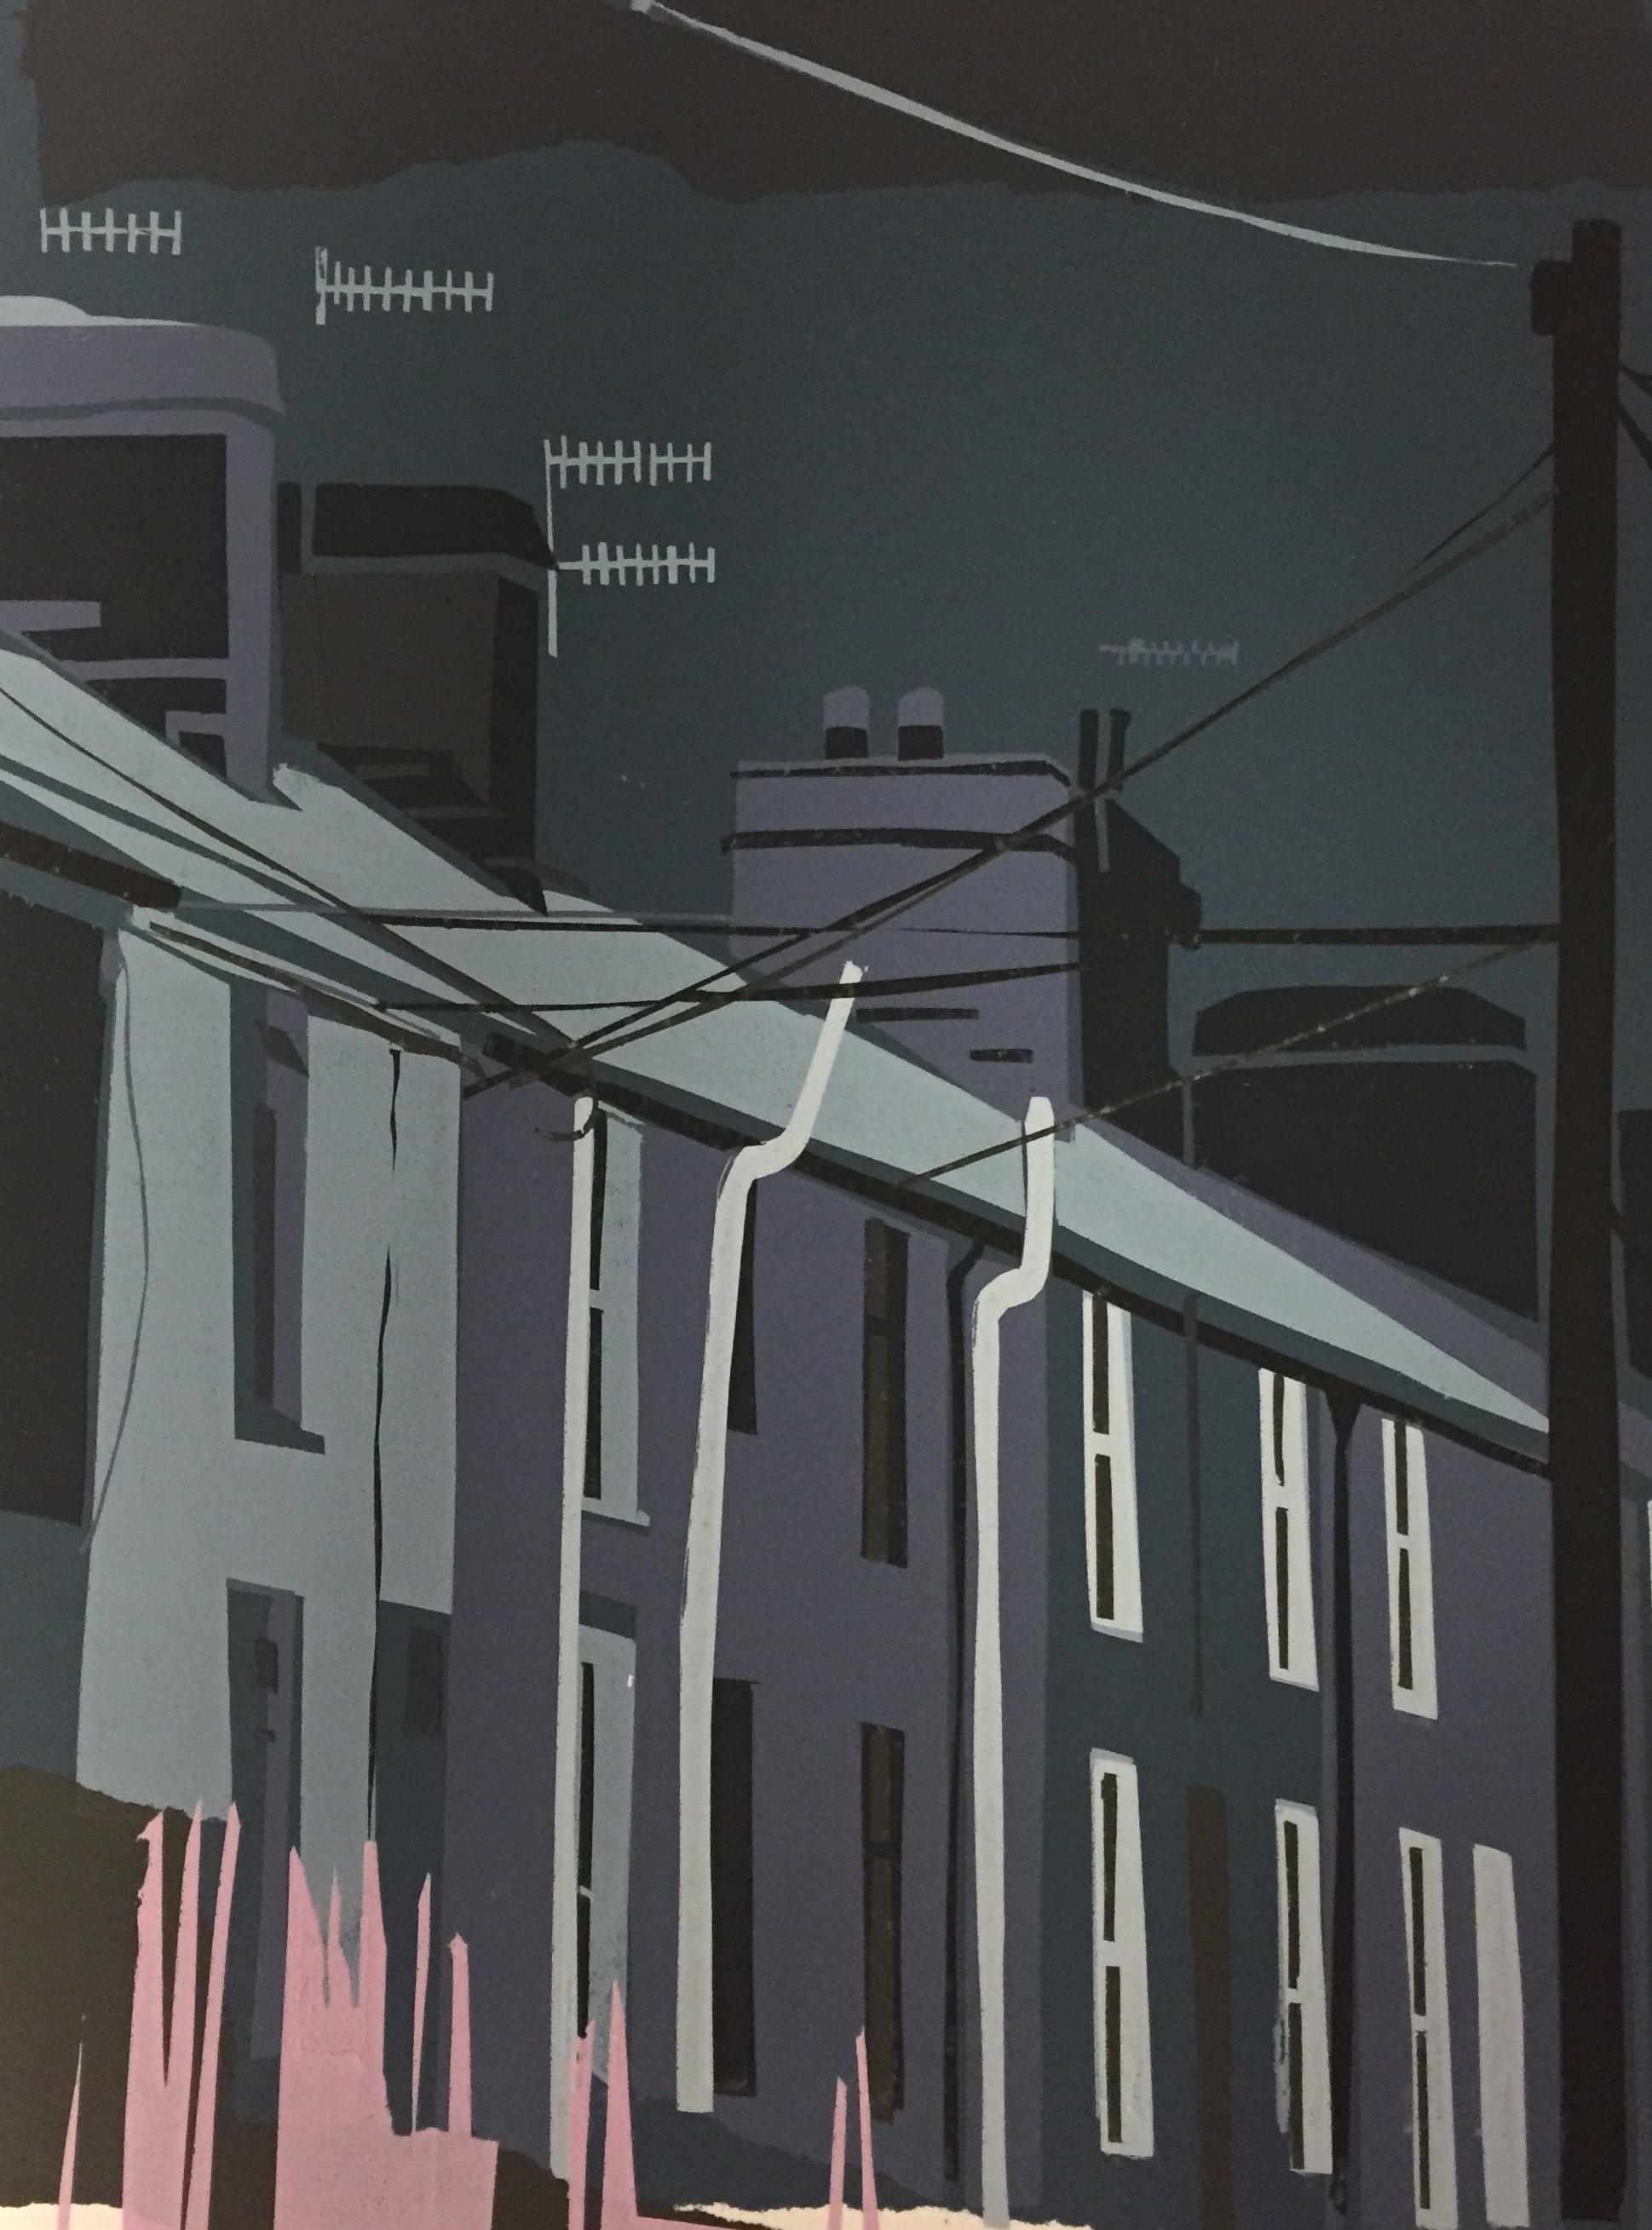 Terrace   12x9 ins   Screenprint  5/10